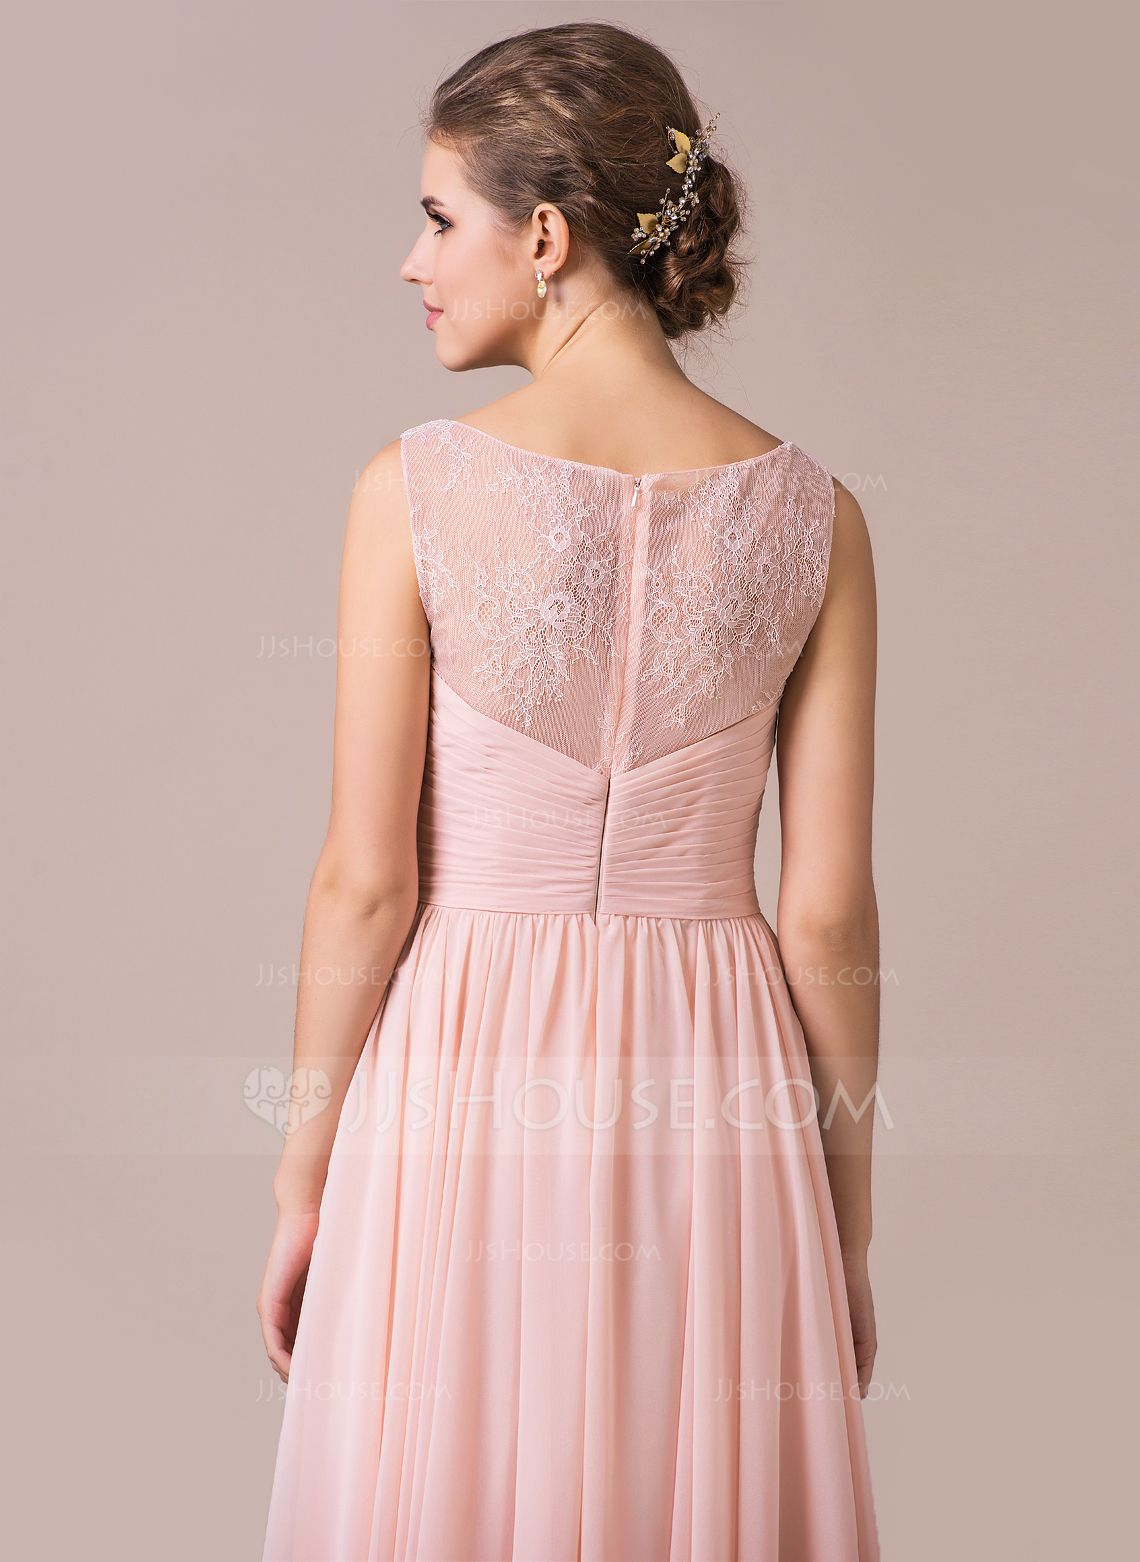 Chiffon Lace A-Line Floor-length Bridesmaid Dress | Lace bridesmaids ...